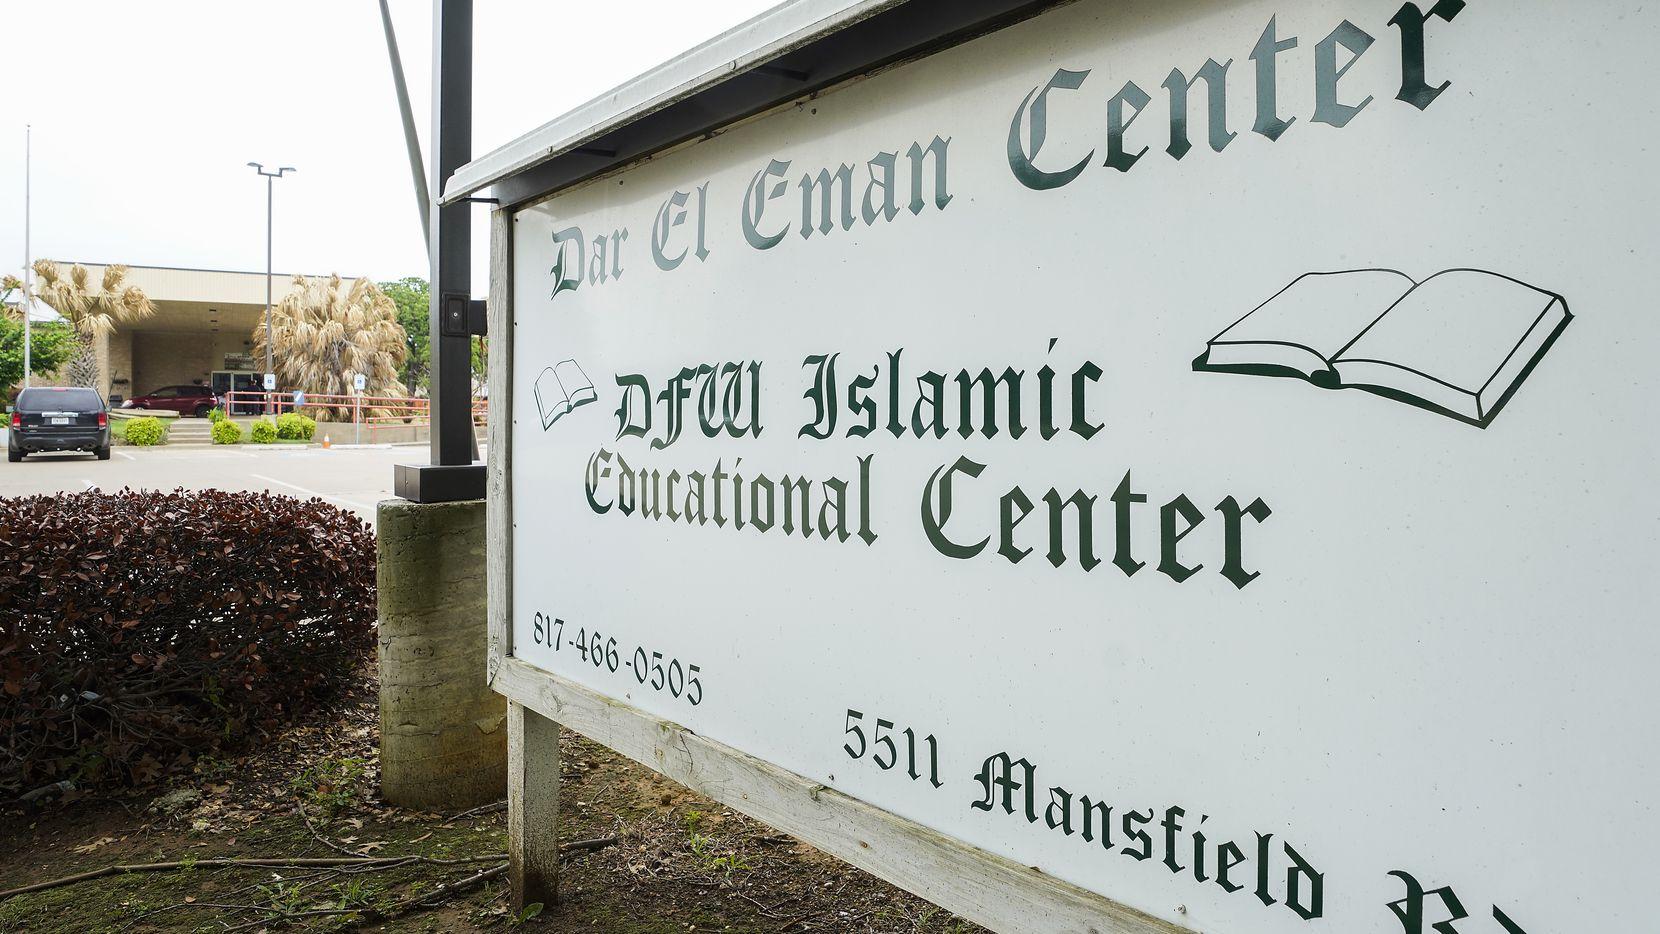 Dar El-Eman Islamic Center on Mansfield Road in Arlington.